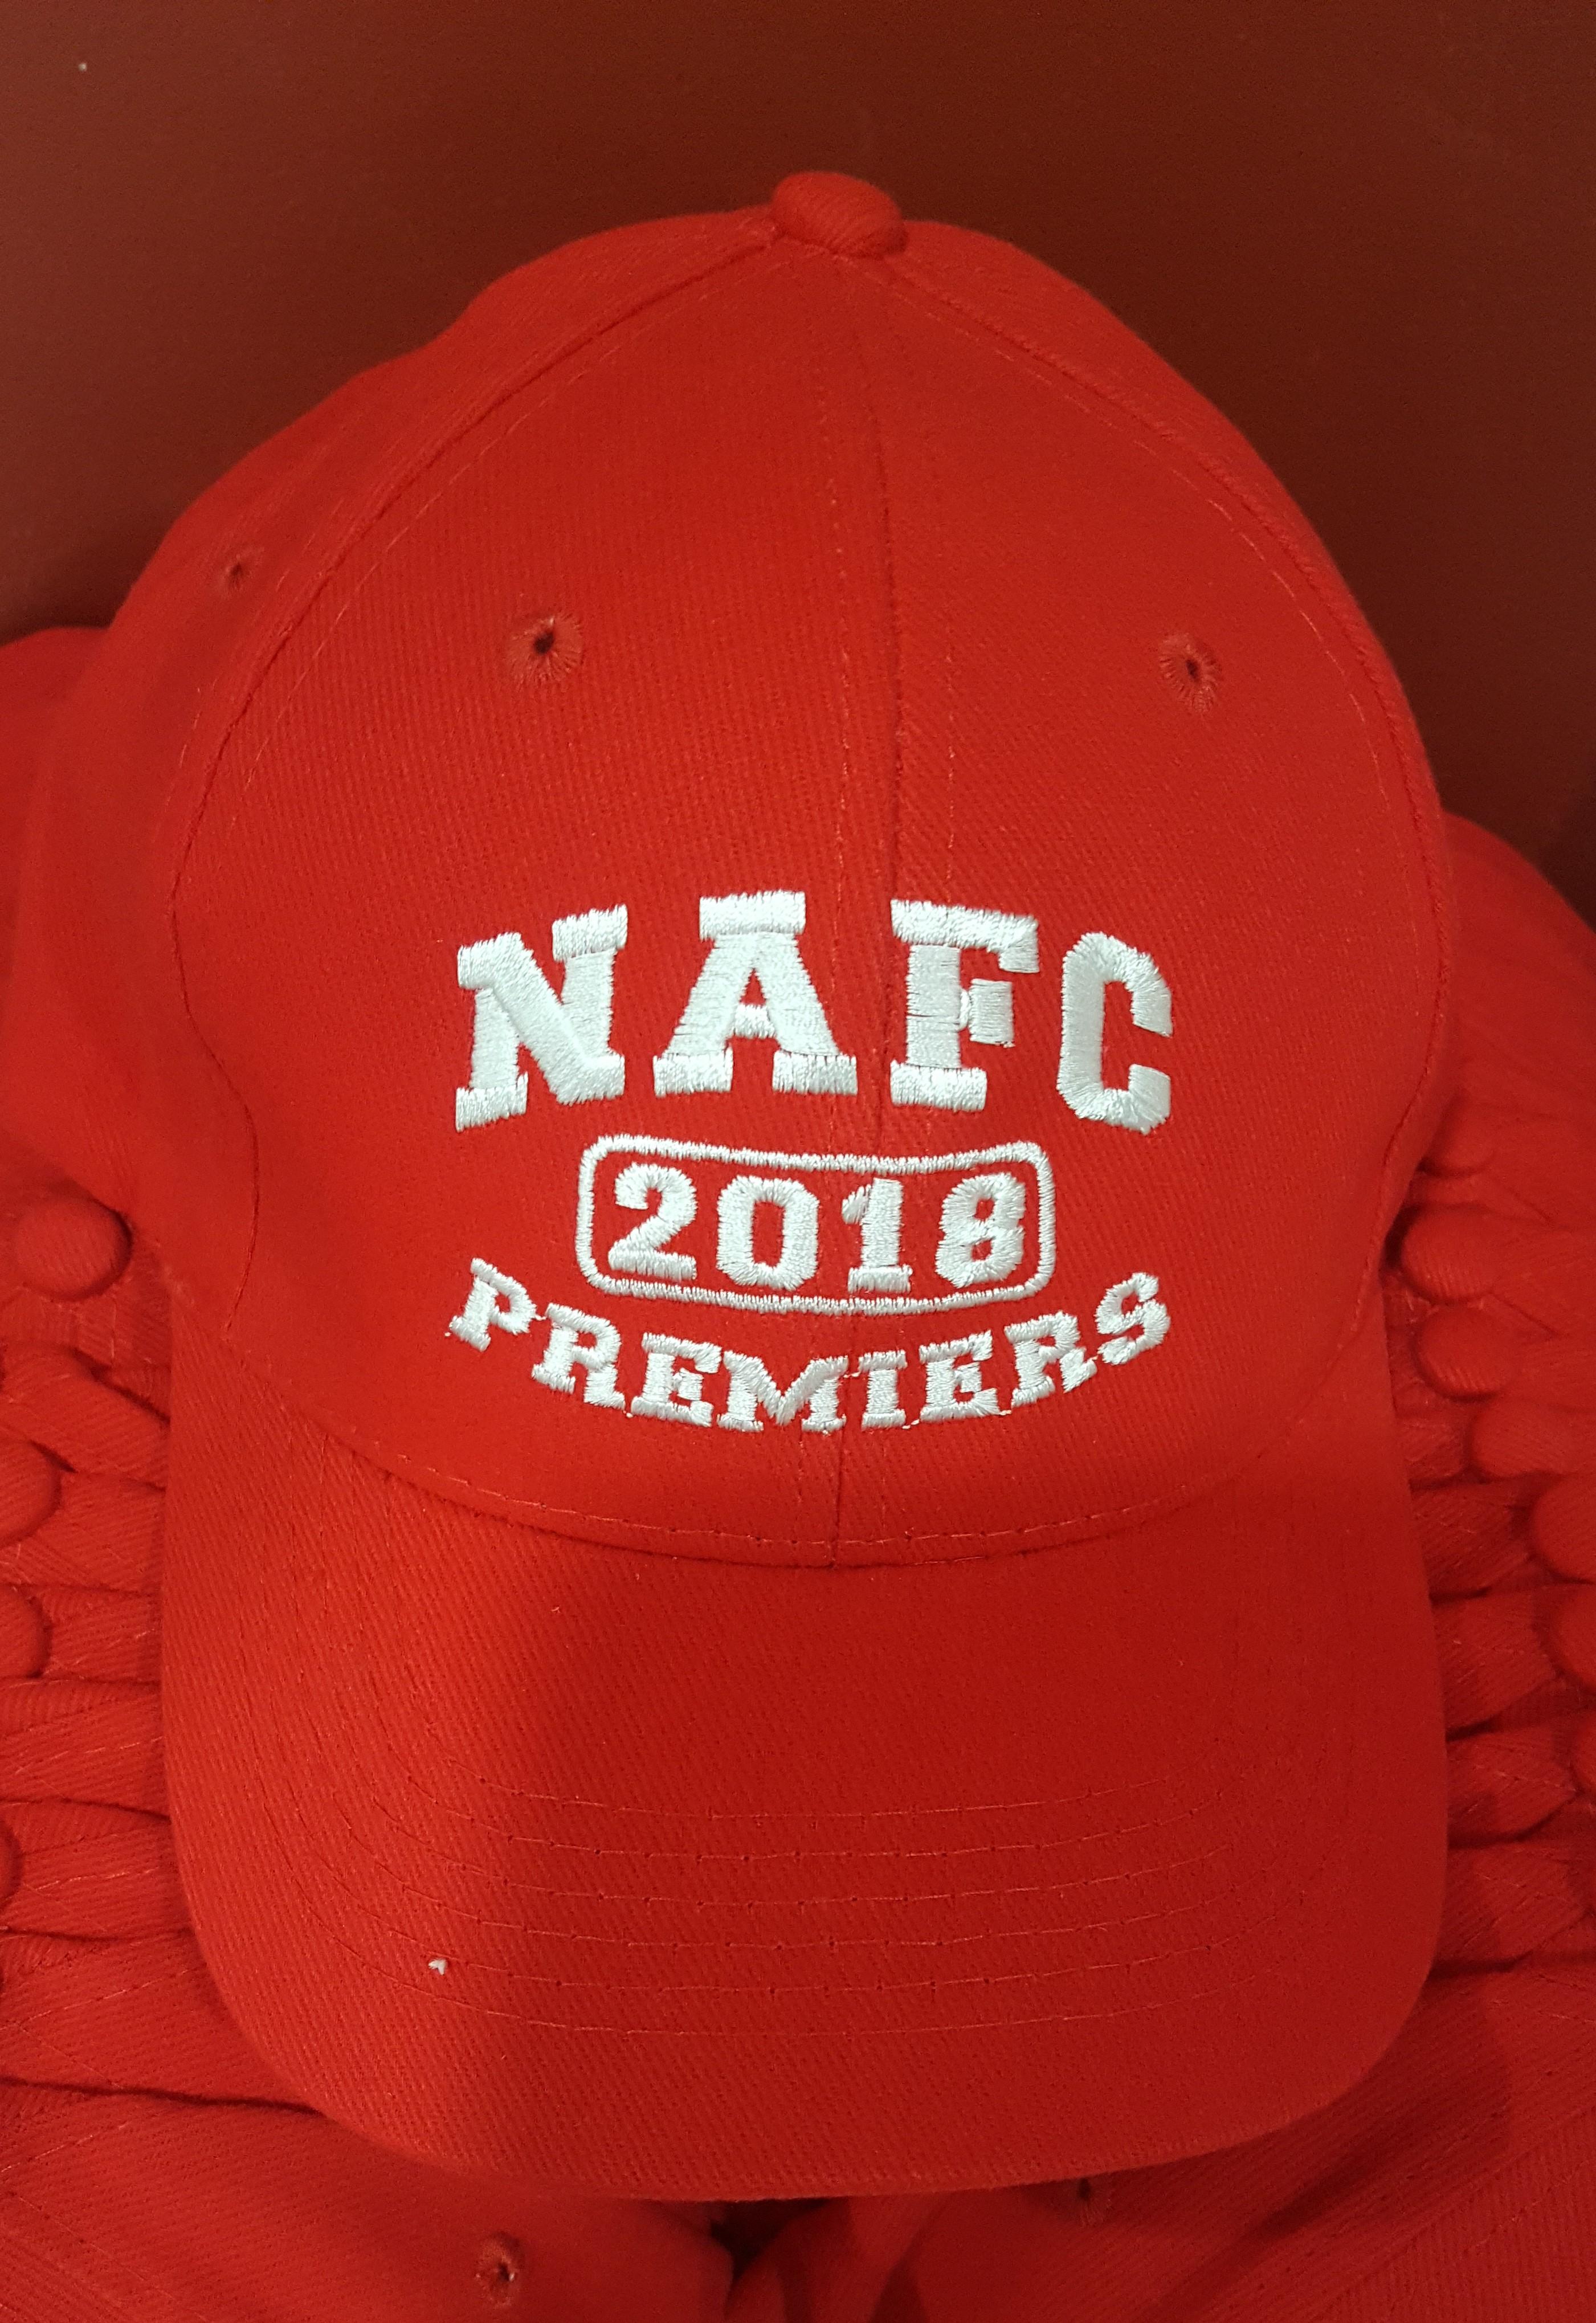 2018 Premiership cap